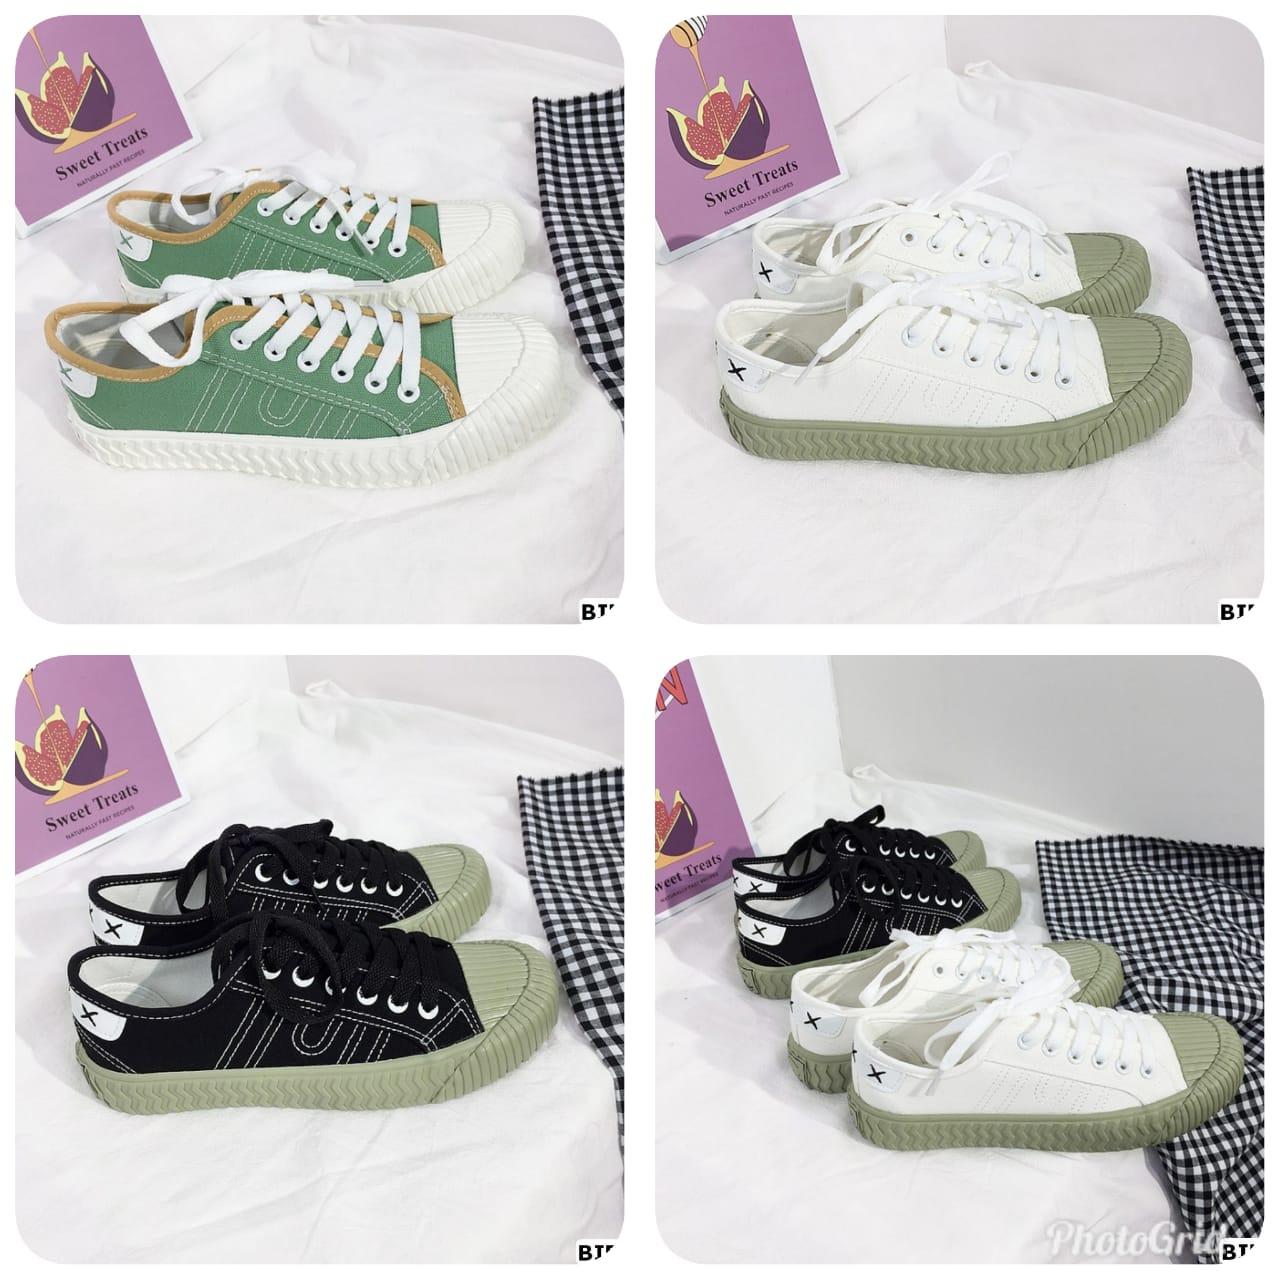 Kode GI 013 : Fergie Sneaker Shoes BID - PSB 4